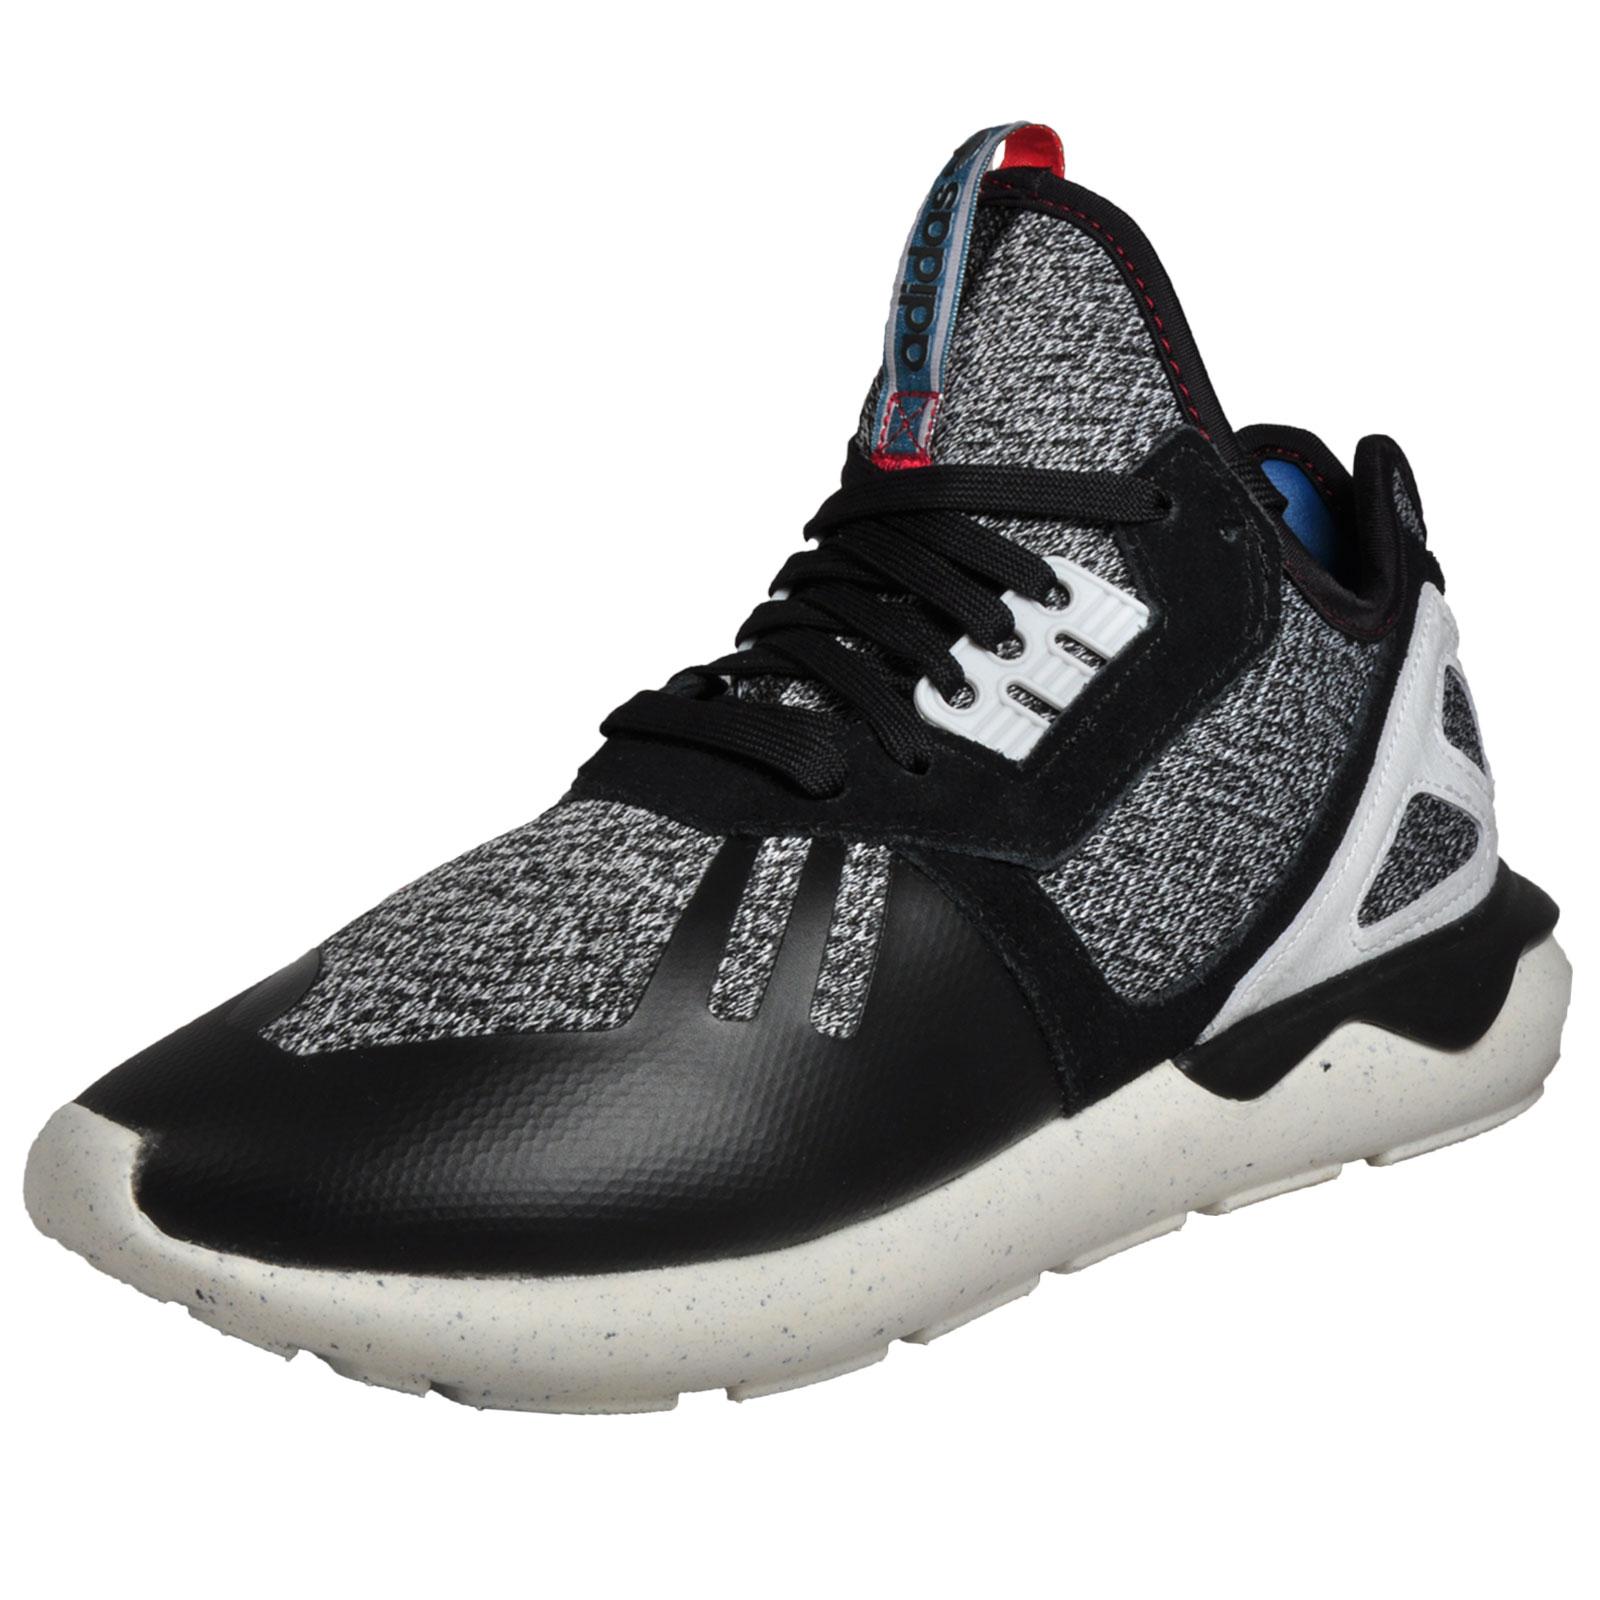 329064789d9 Details about Adidas Originals Tubular Runner Mens Classic Casual Retro  Running Shoes Black